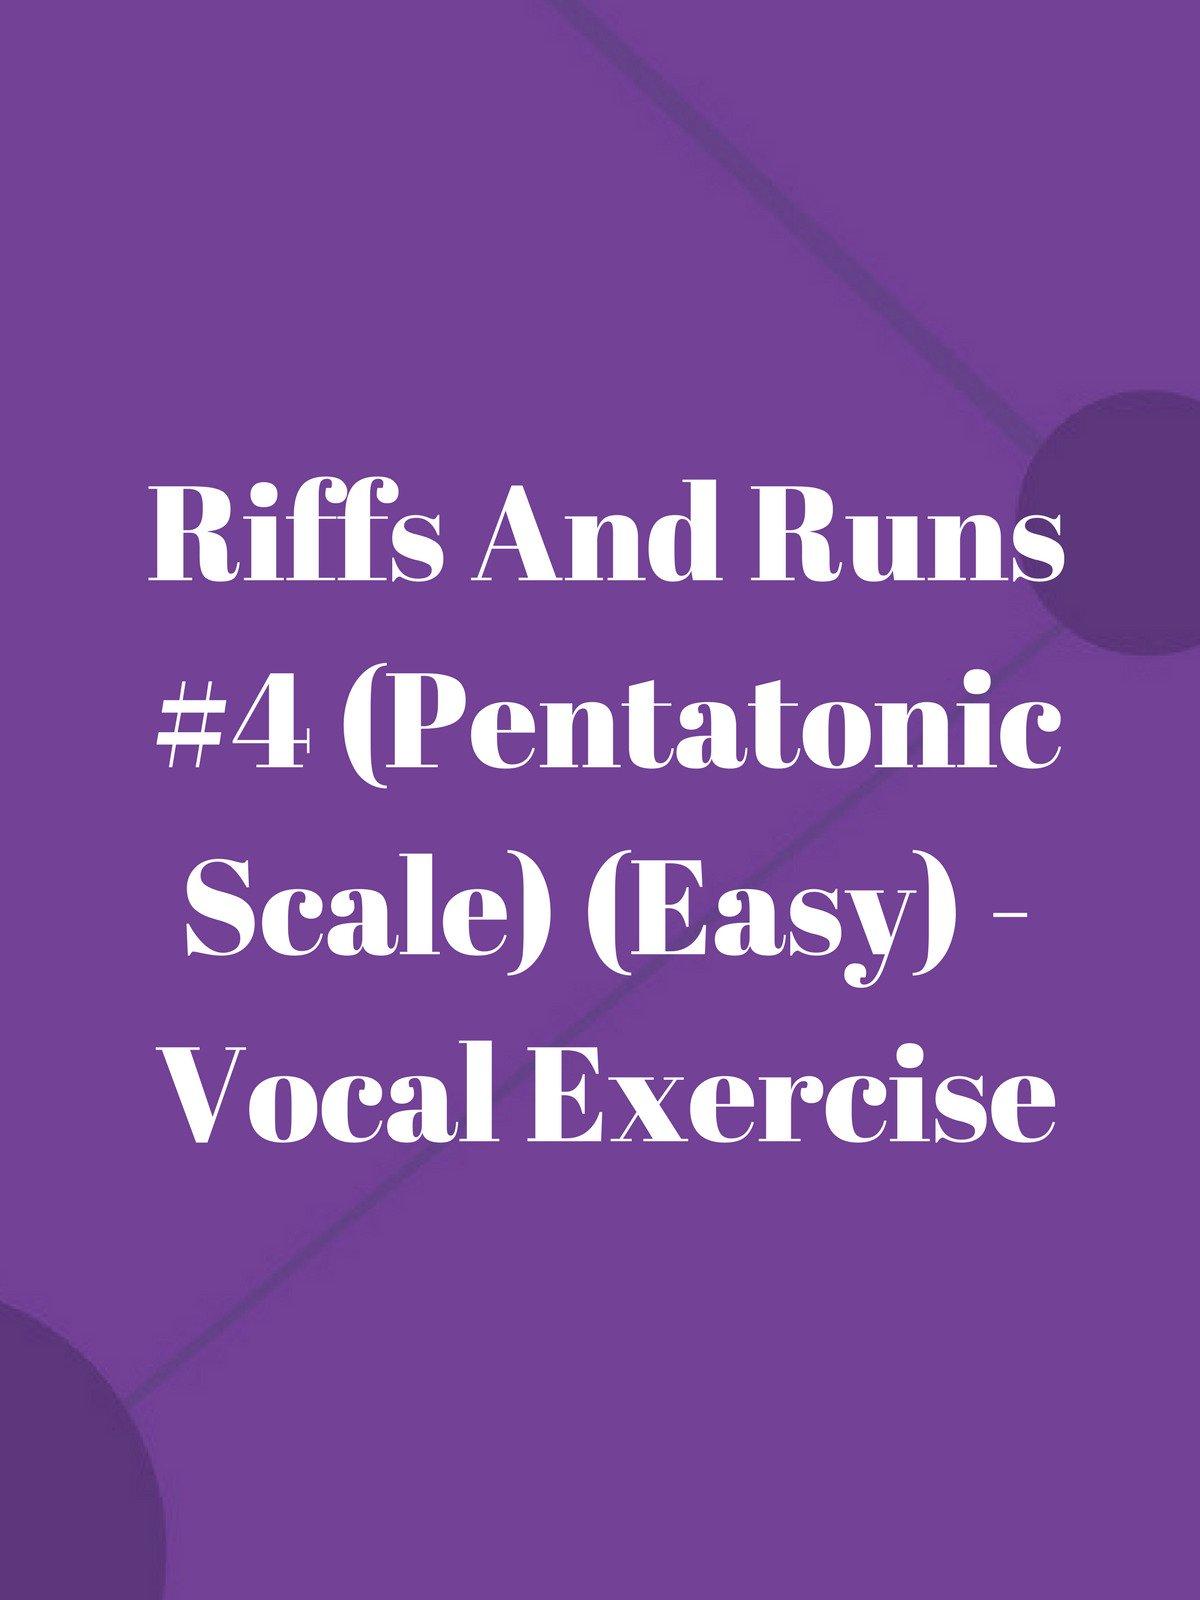 Riffs And Runs #4 (Pentatonic Scale) (Easy)